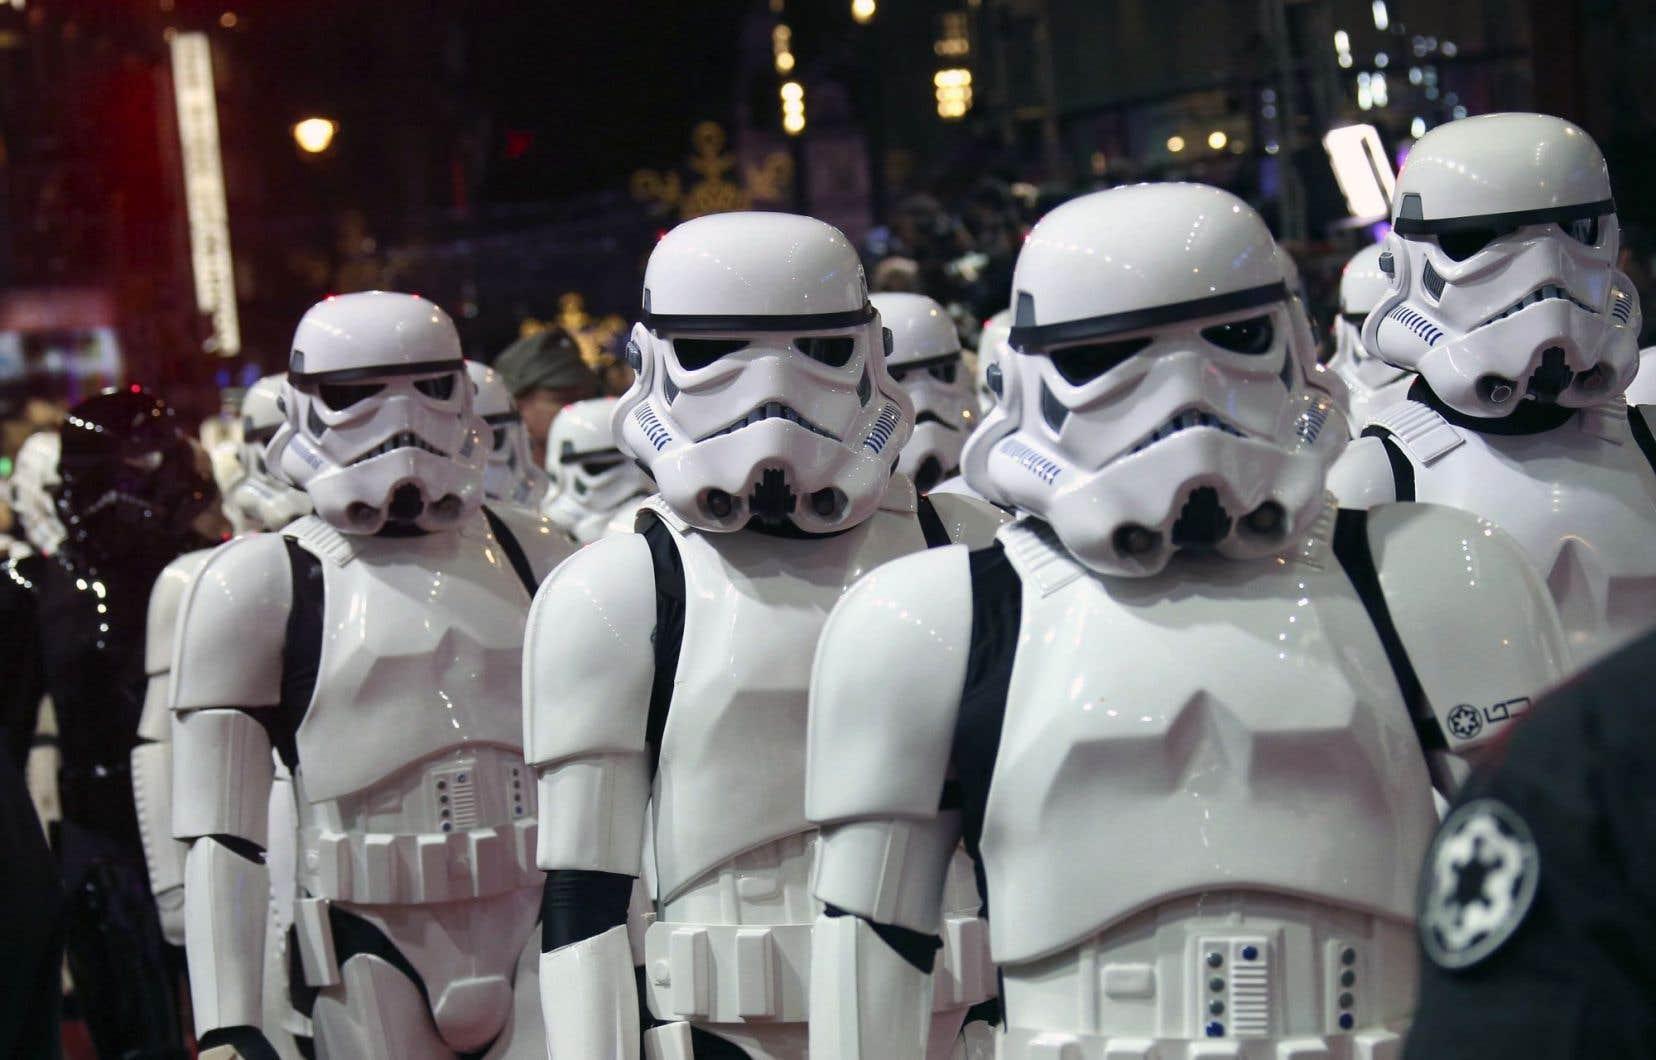 Lempire Disney Contre Attaque Avec Un Nouveau Service De Streaming